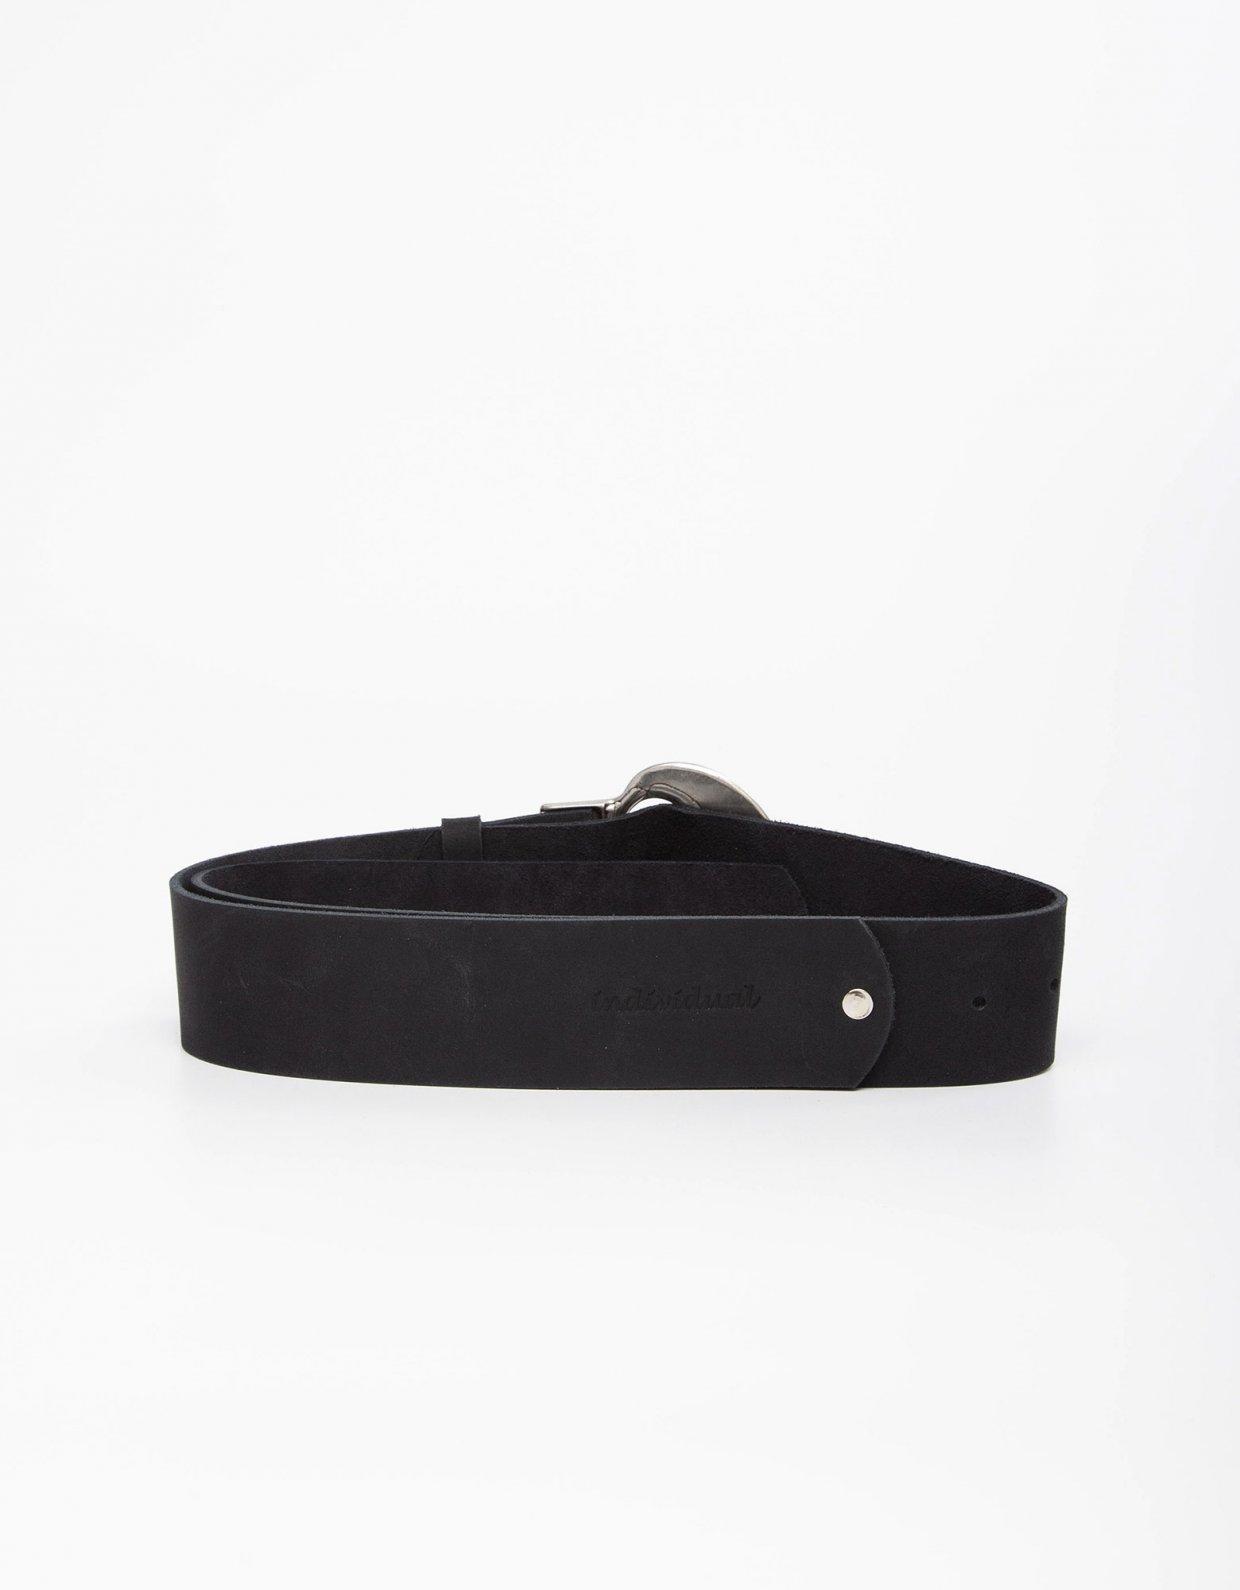 Individual Art Leather Darling black belt